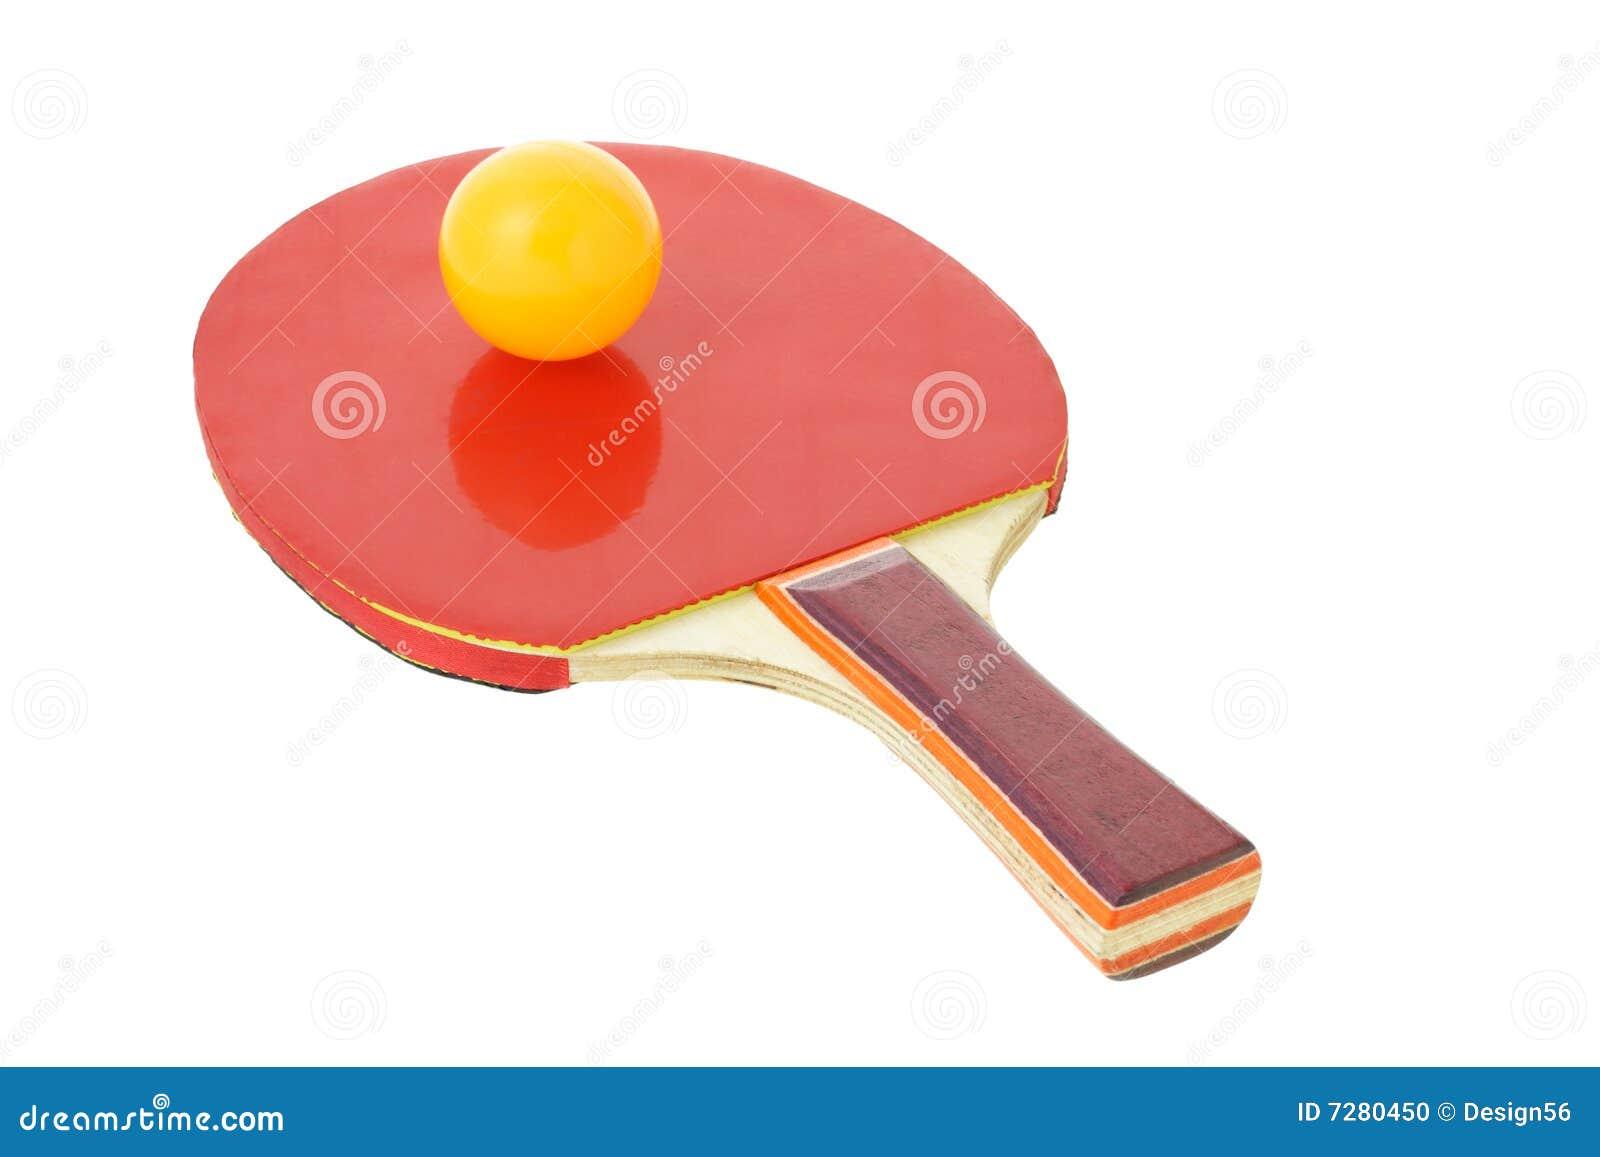 Table Tennis Bat And Ball Stock Photo Image 7280450